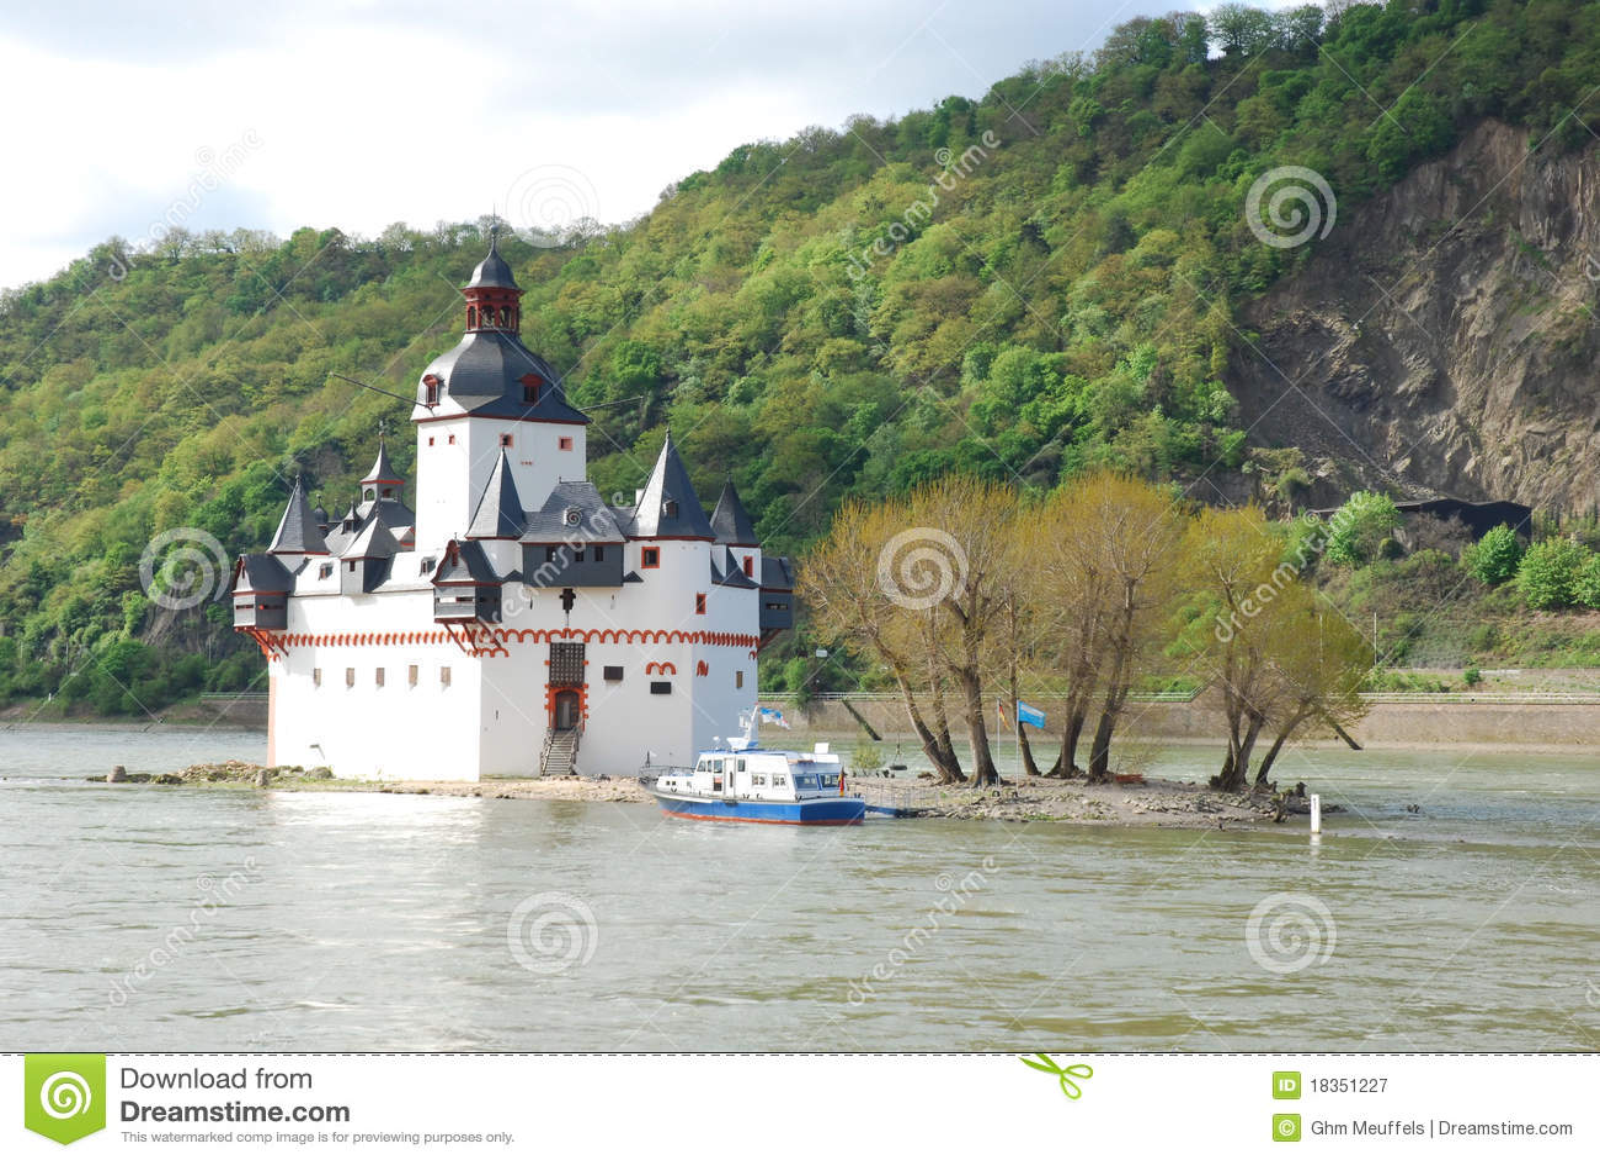 Pfalzgrafenstein Toll Castle, Kaub, Germany